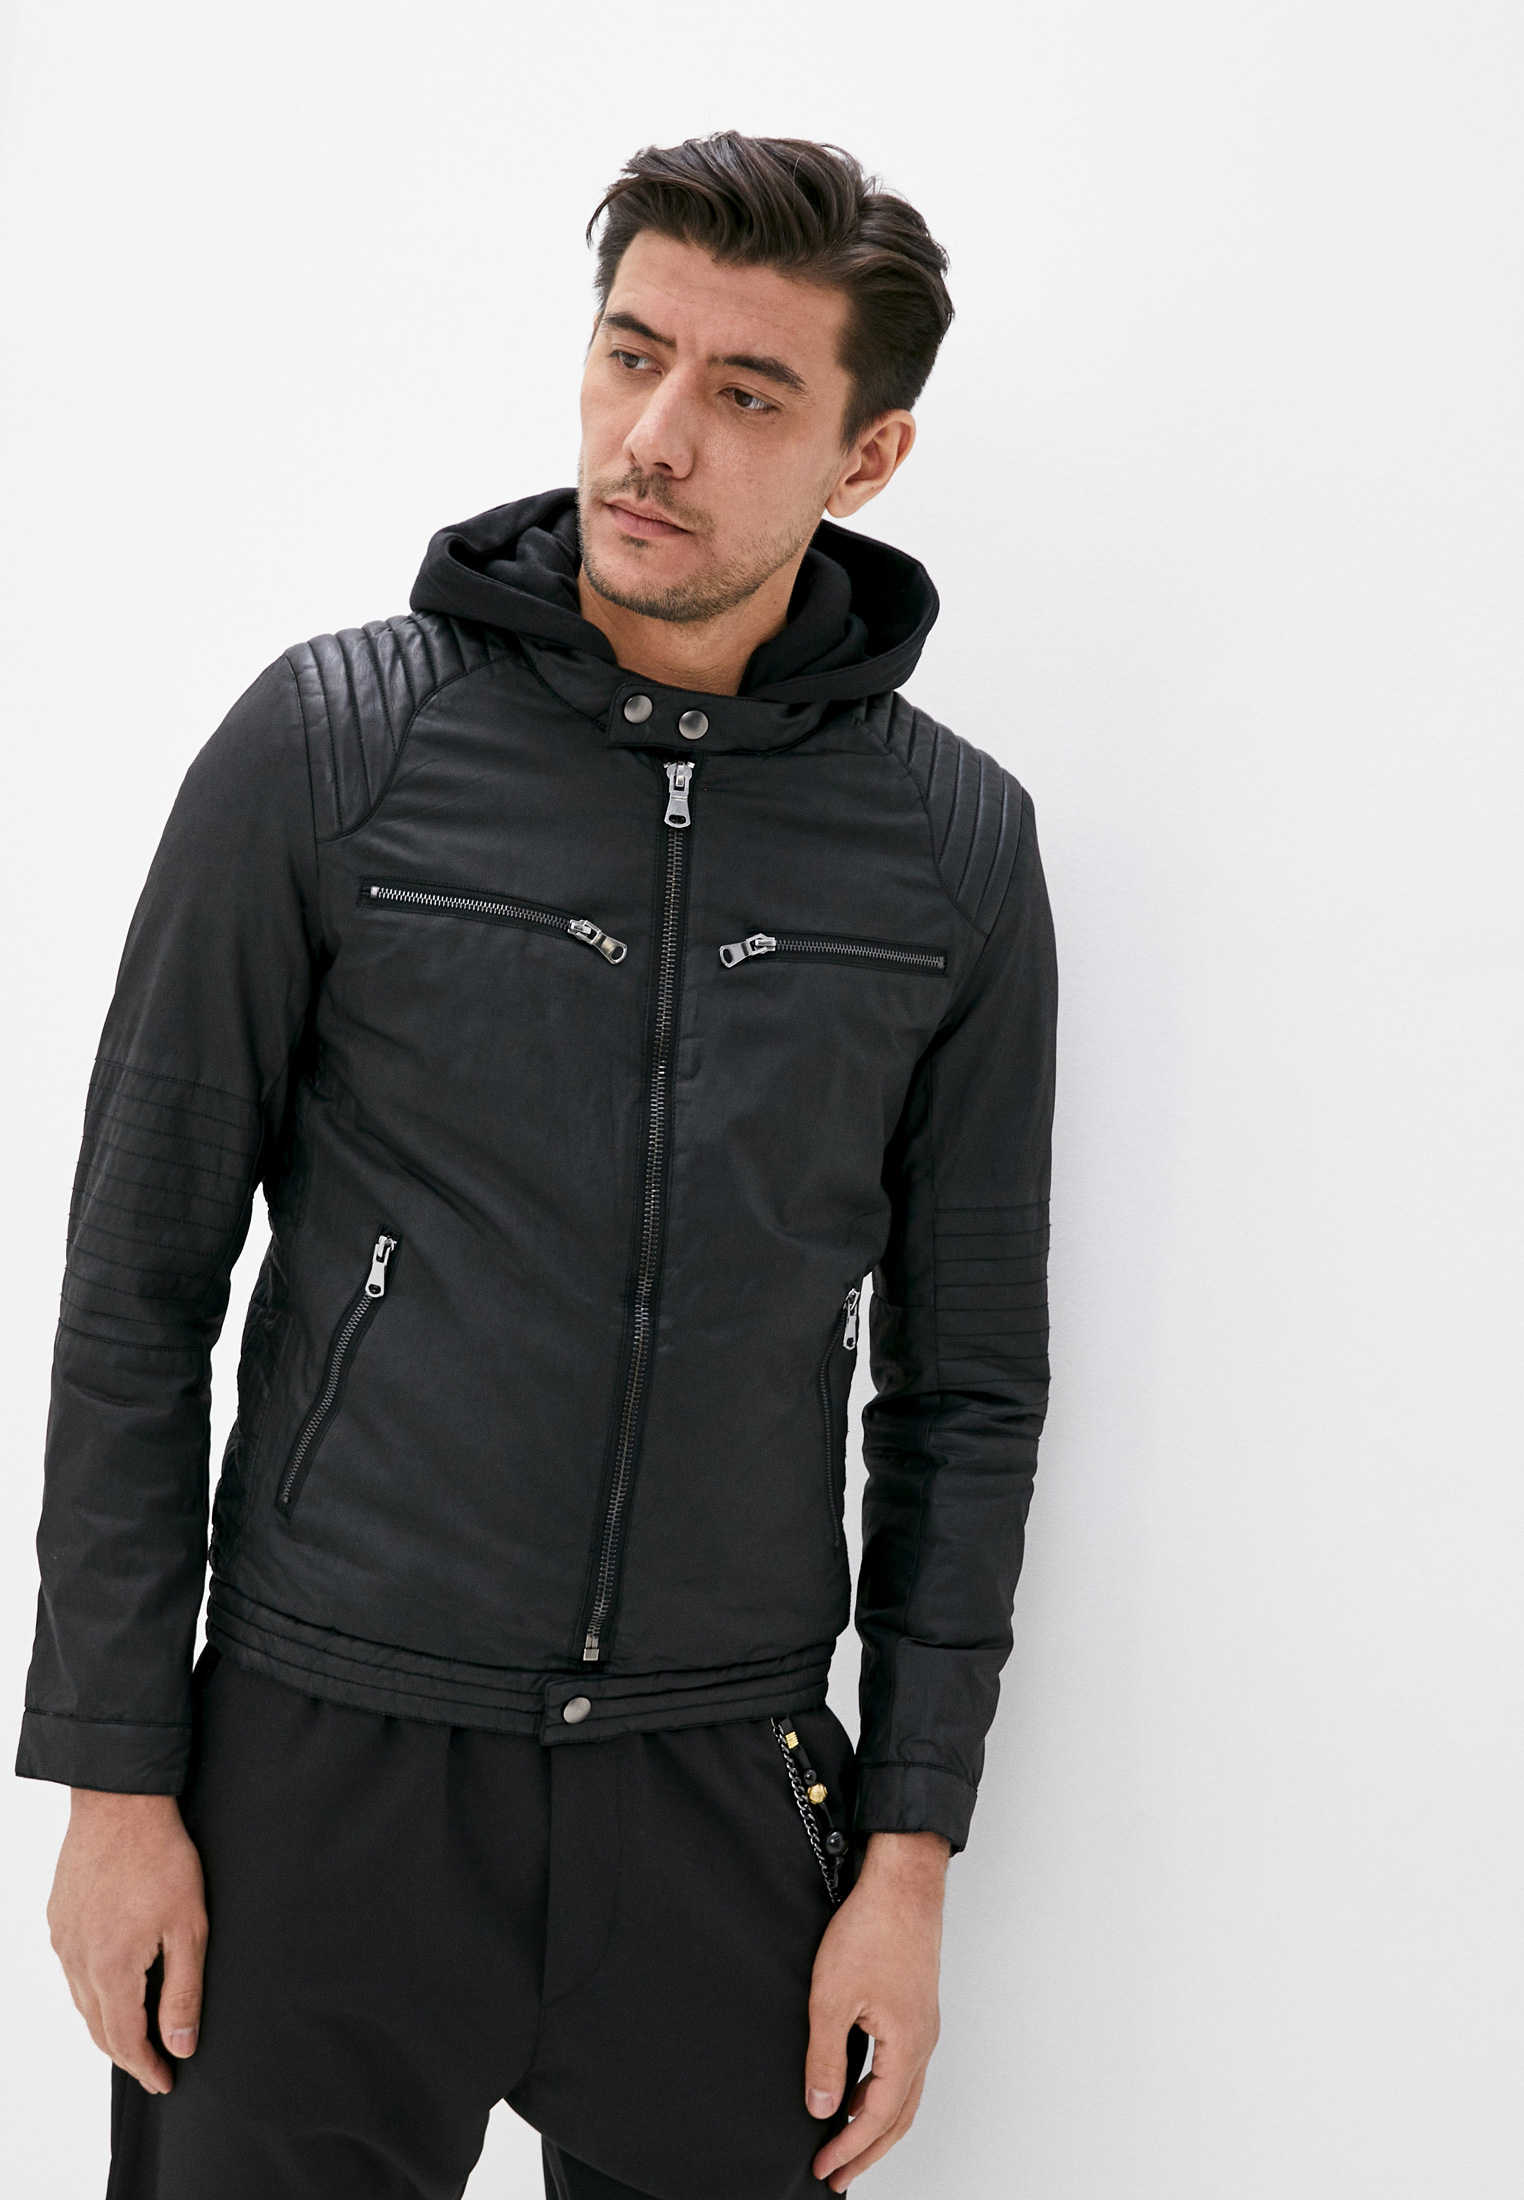 Кожаная куртка Jackets Industry M525